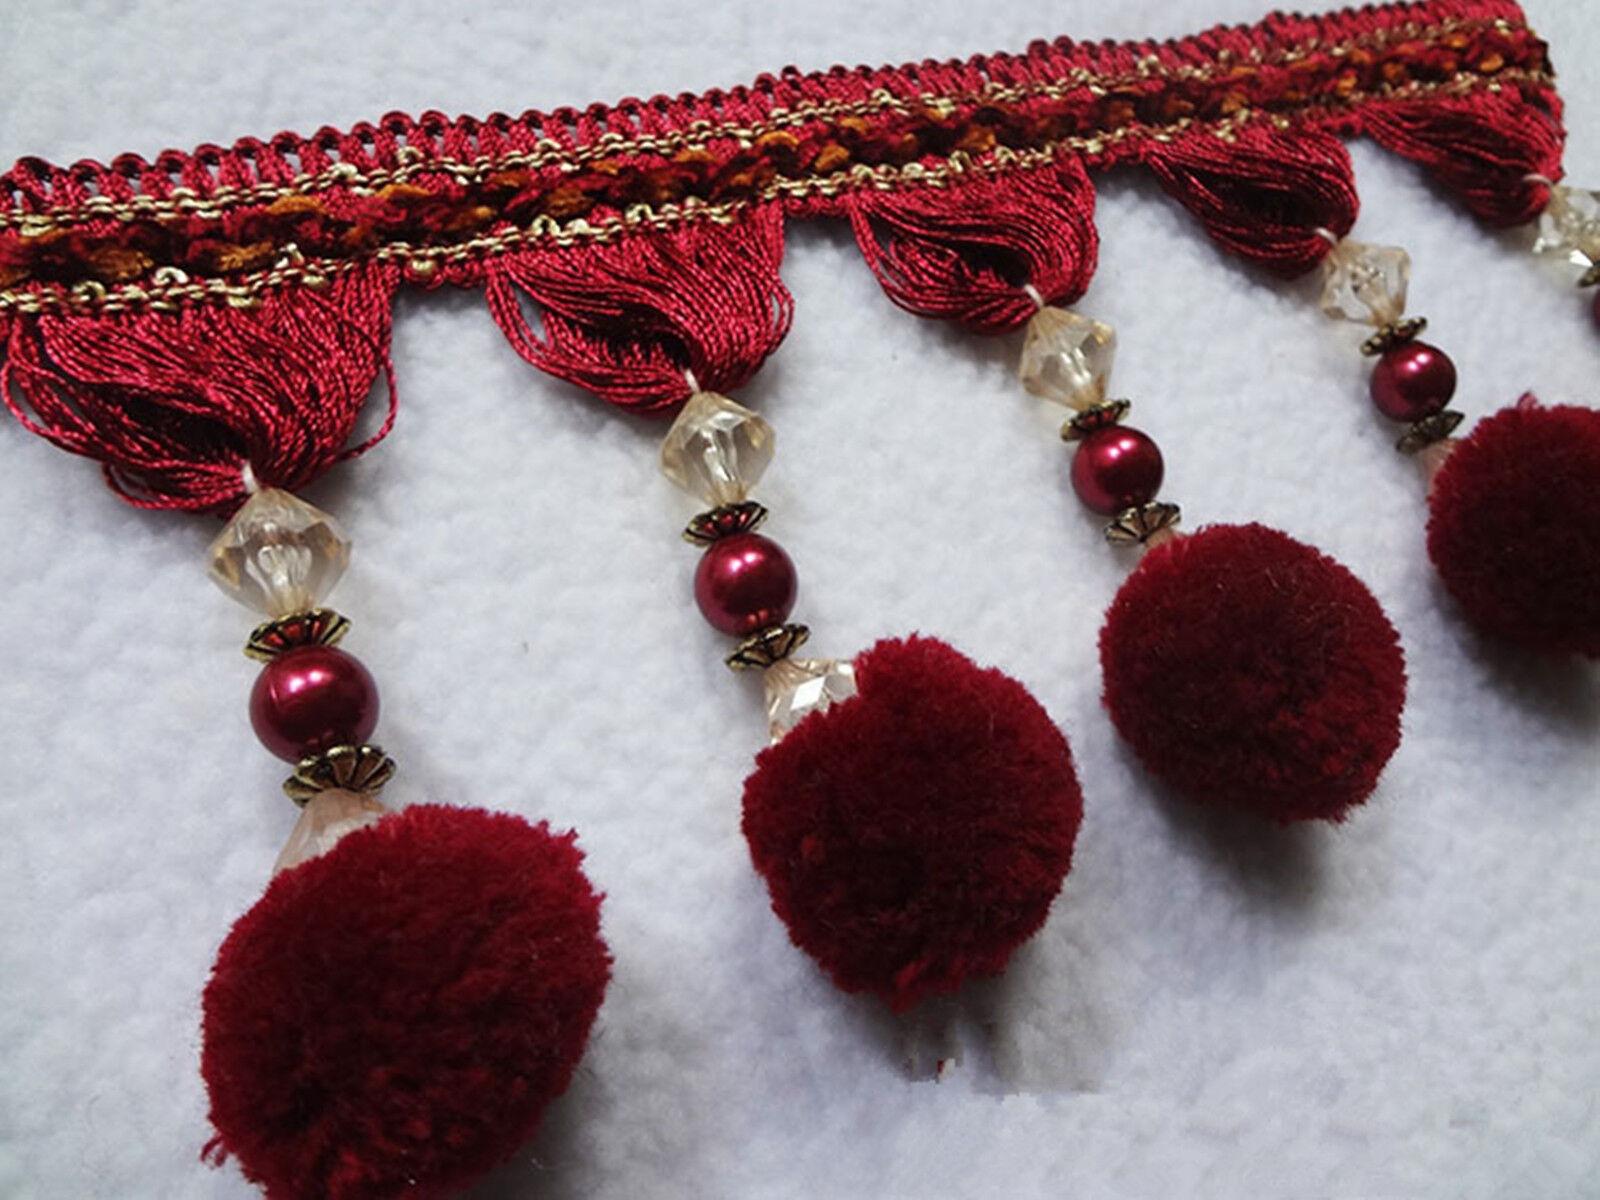 1Meter Craft Pom Pom Ball Tassel Fringe Curtain Carpet ...